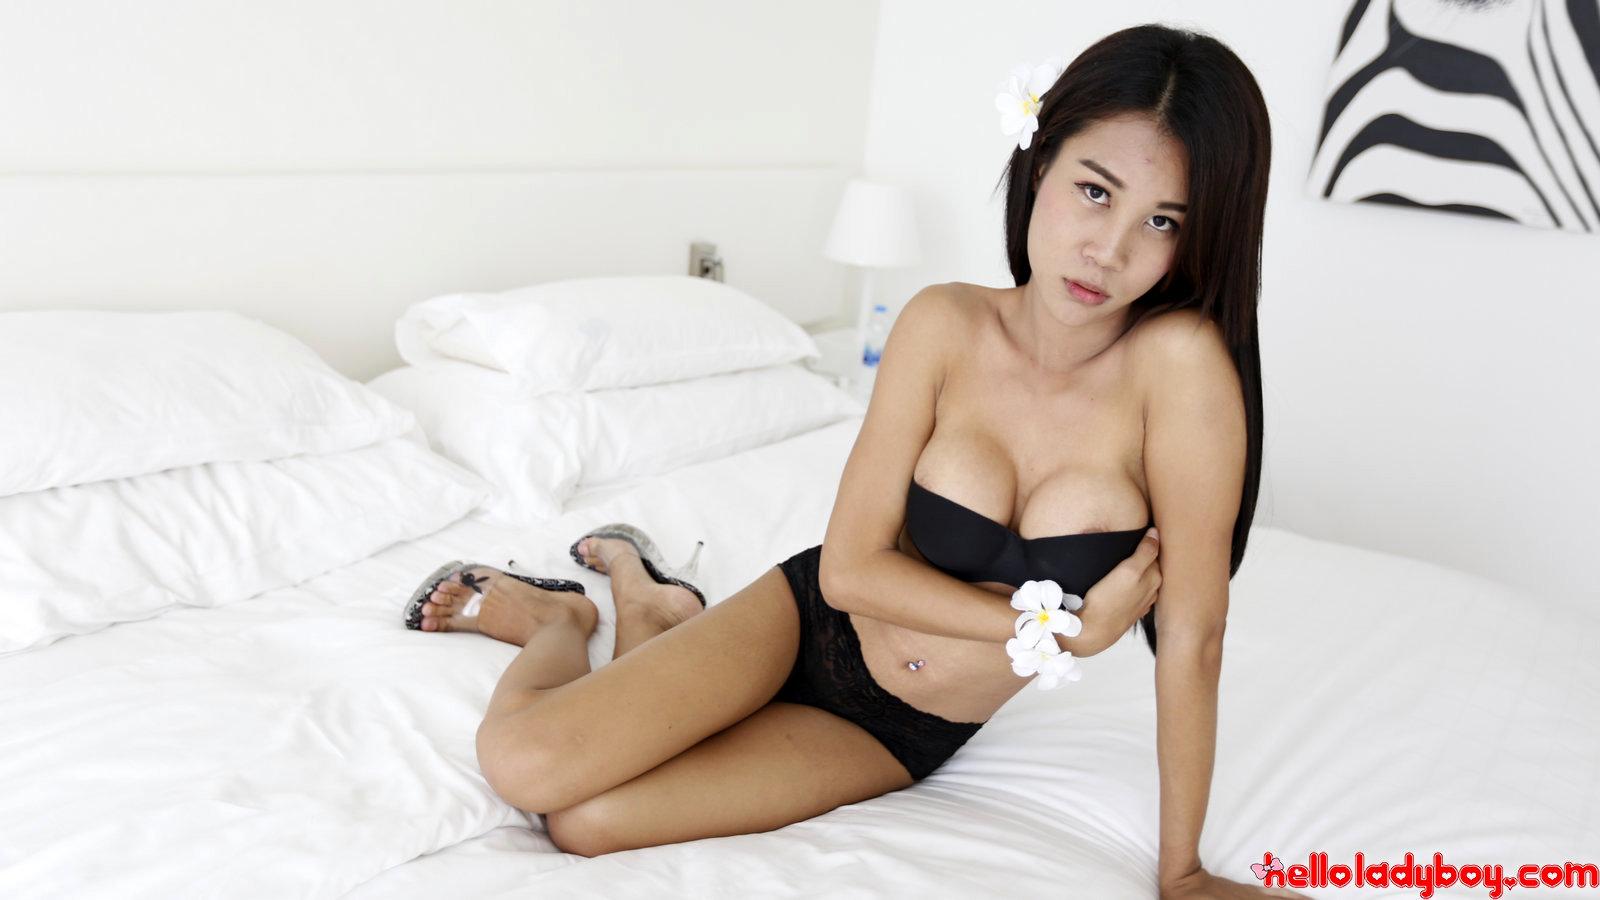 Asian T-Girl Bang's And Sucks White Tourist Penis